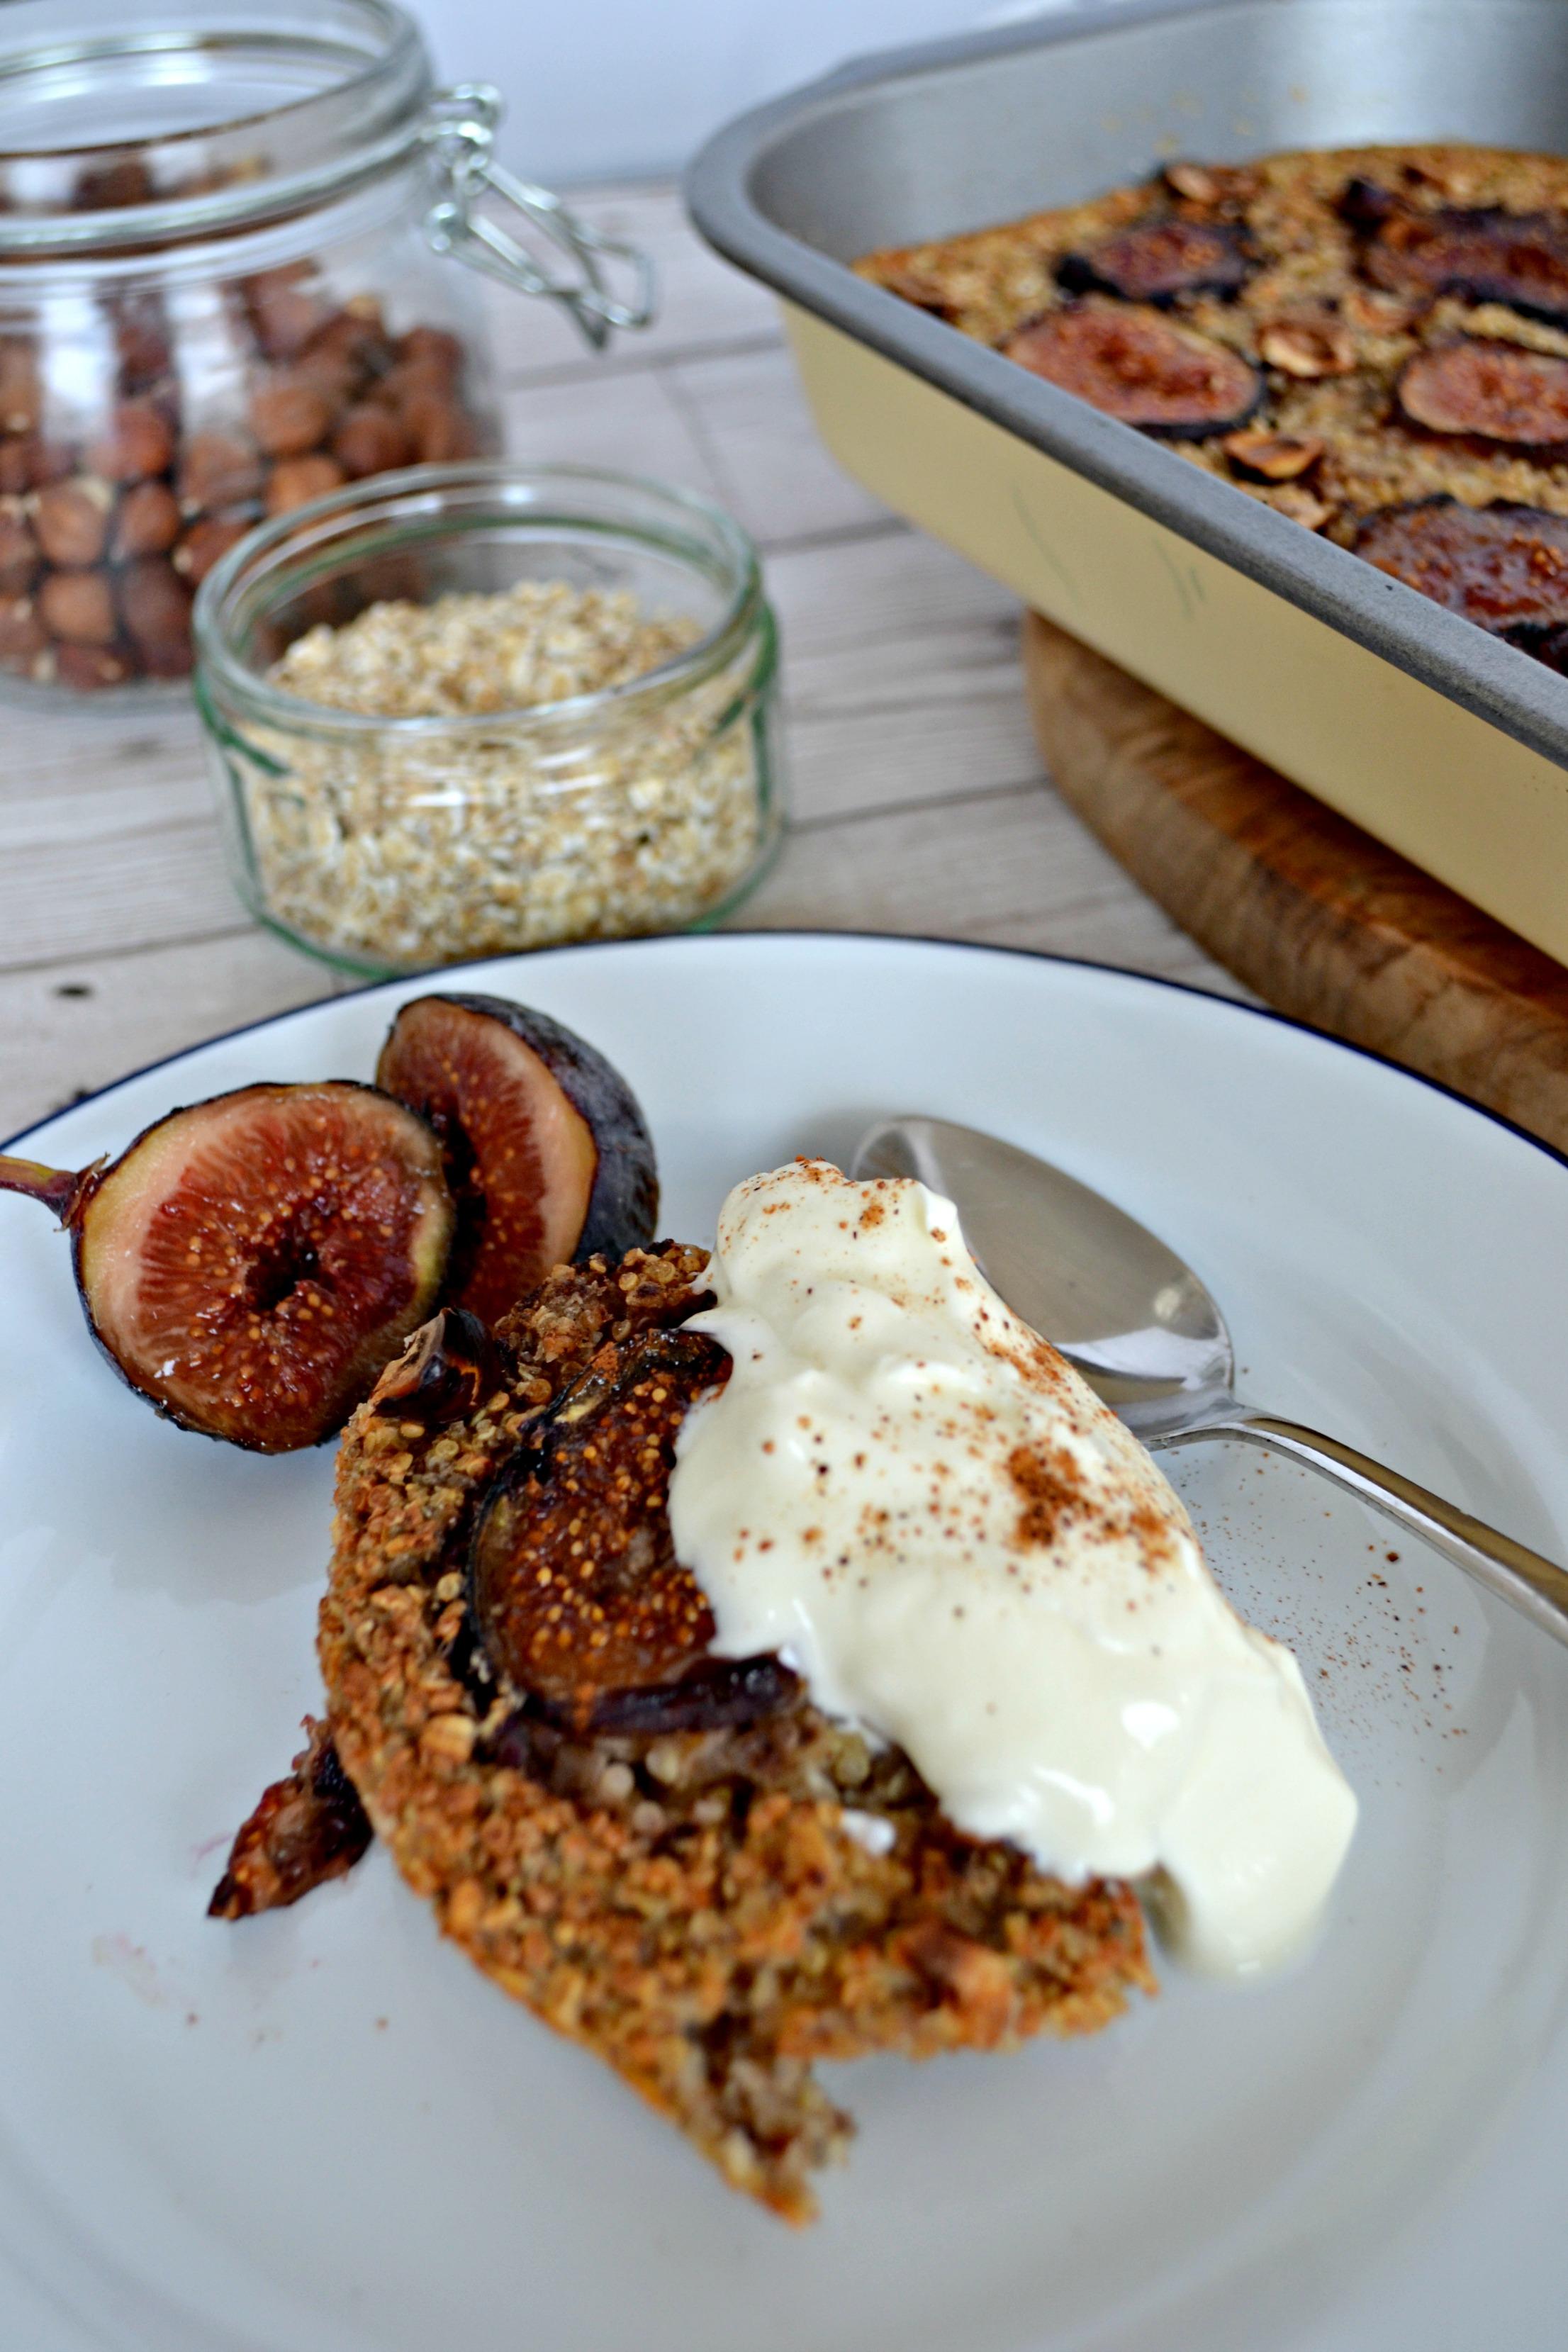 Baked fig and hazelnut oatmeal   The Flourishing Pantry   healthy eating recipe blog